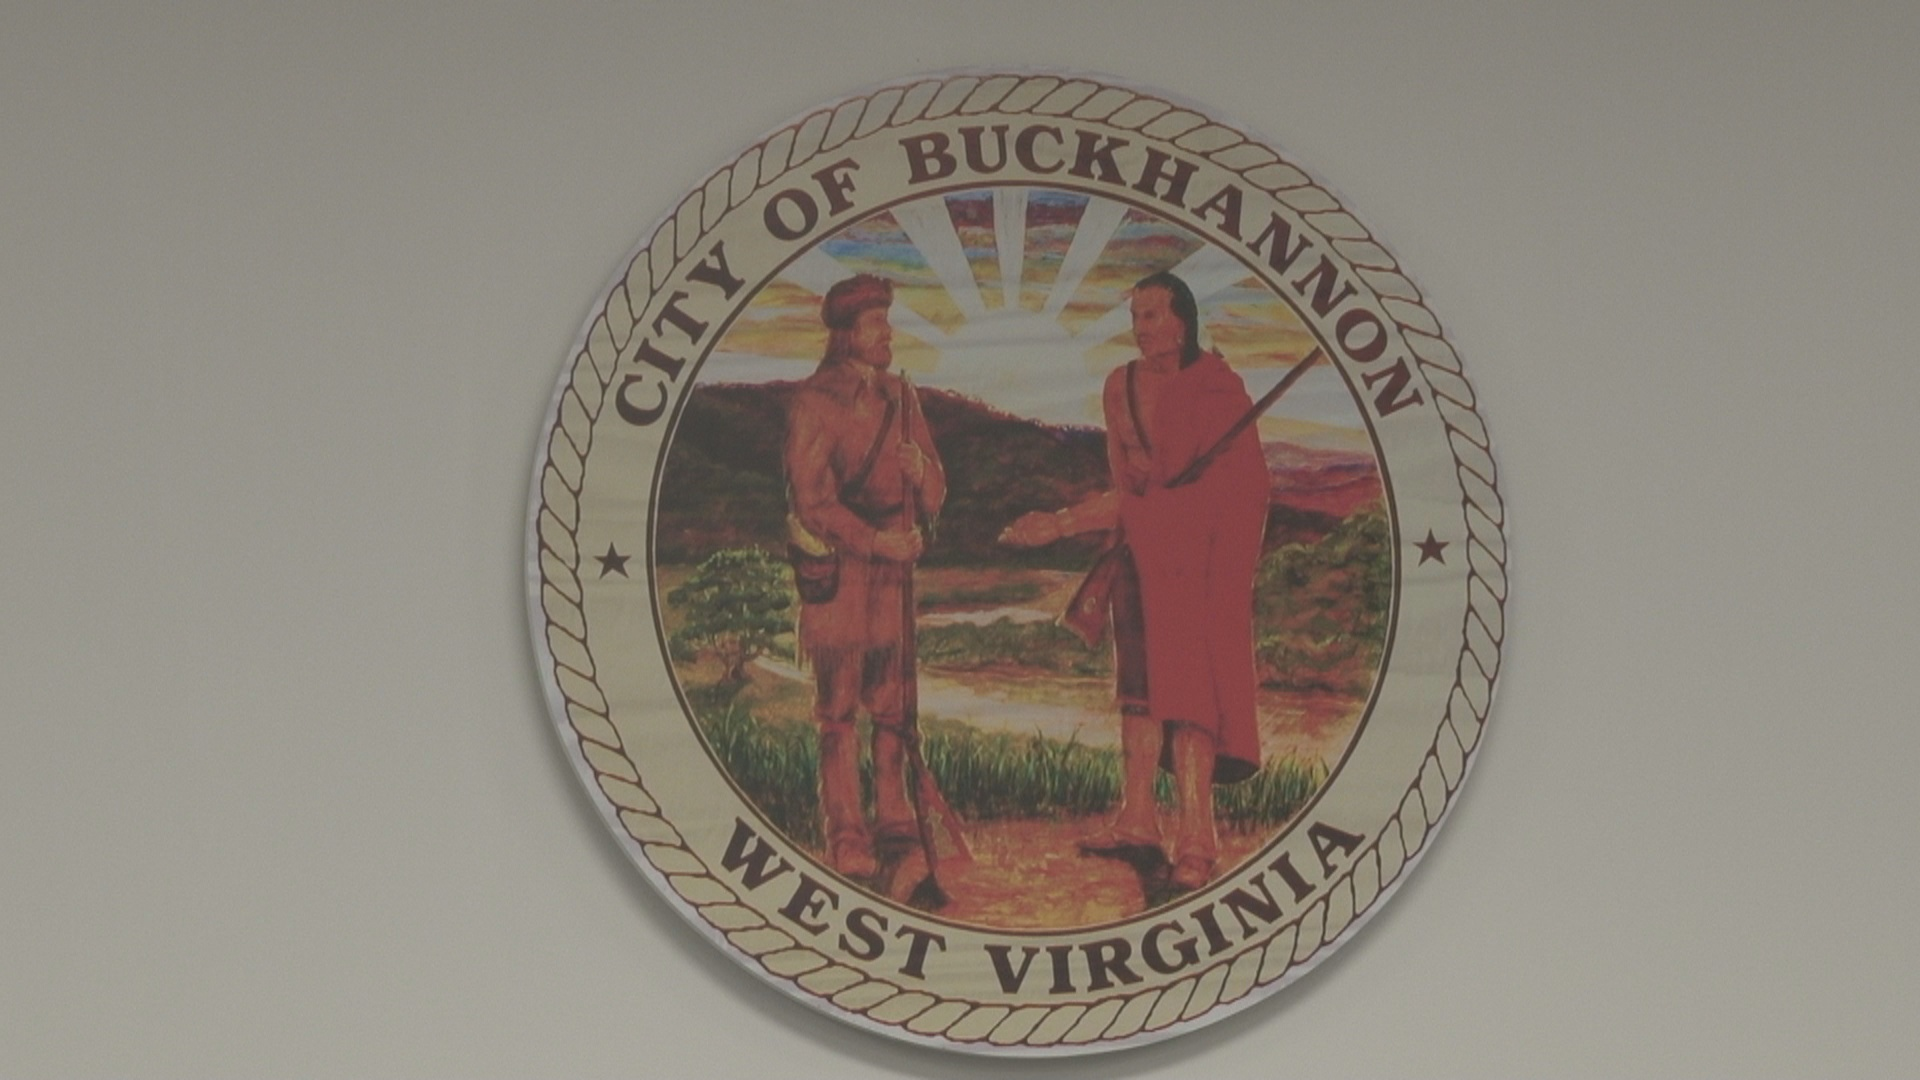 Buckhannon 7.26.18_1532656251157.jpg.jpg